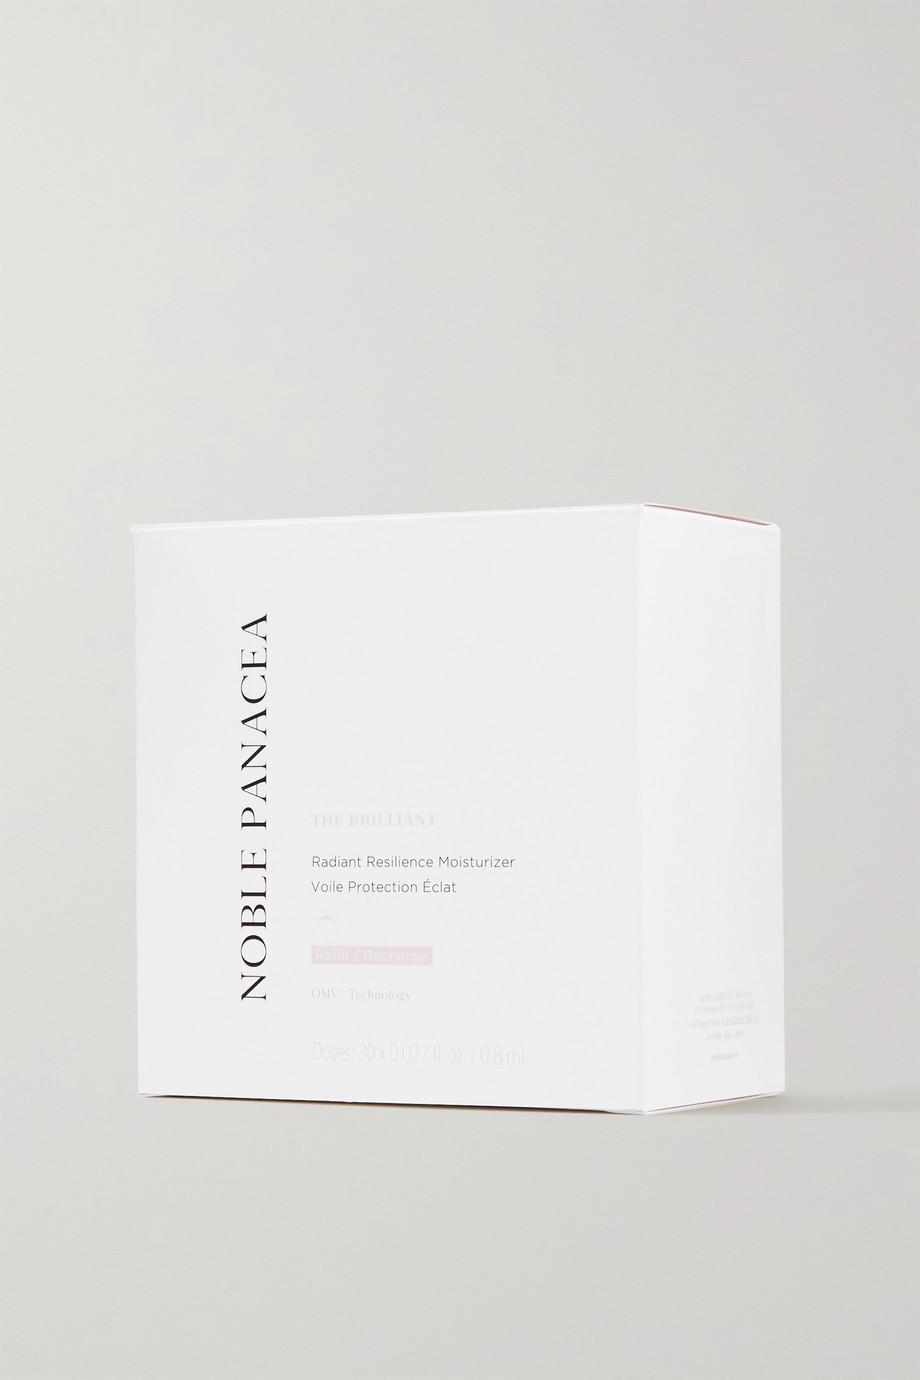 Noble Panacea The Brilliant Radiant Resilience Moisturizer Refill, 30 x 0.8ml